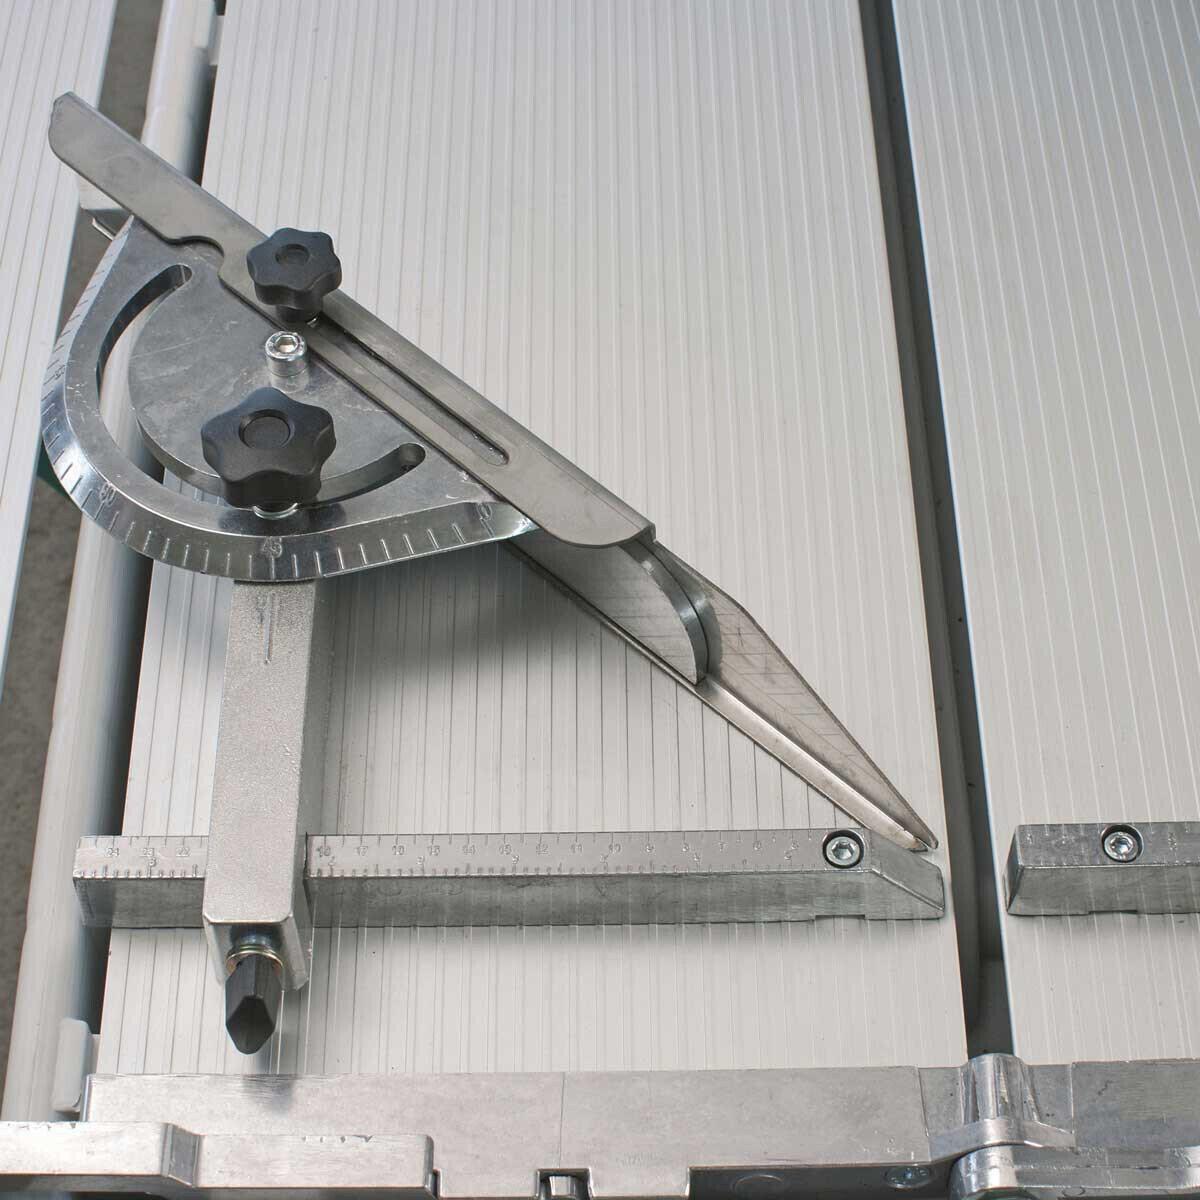 1188174 Imer Combi 250/1000VA Wet Saw rip/angle guide